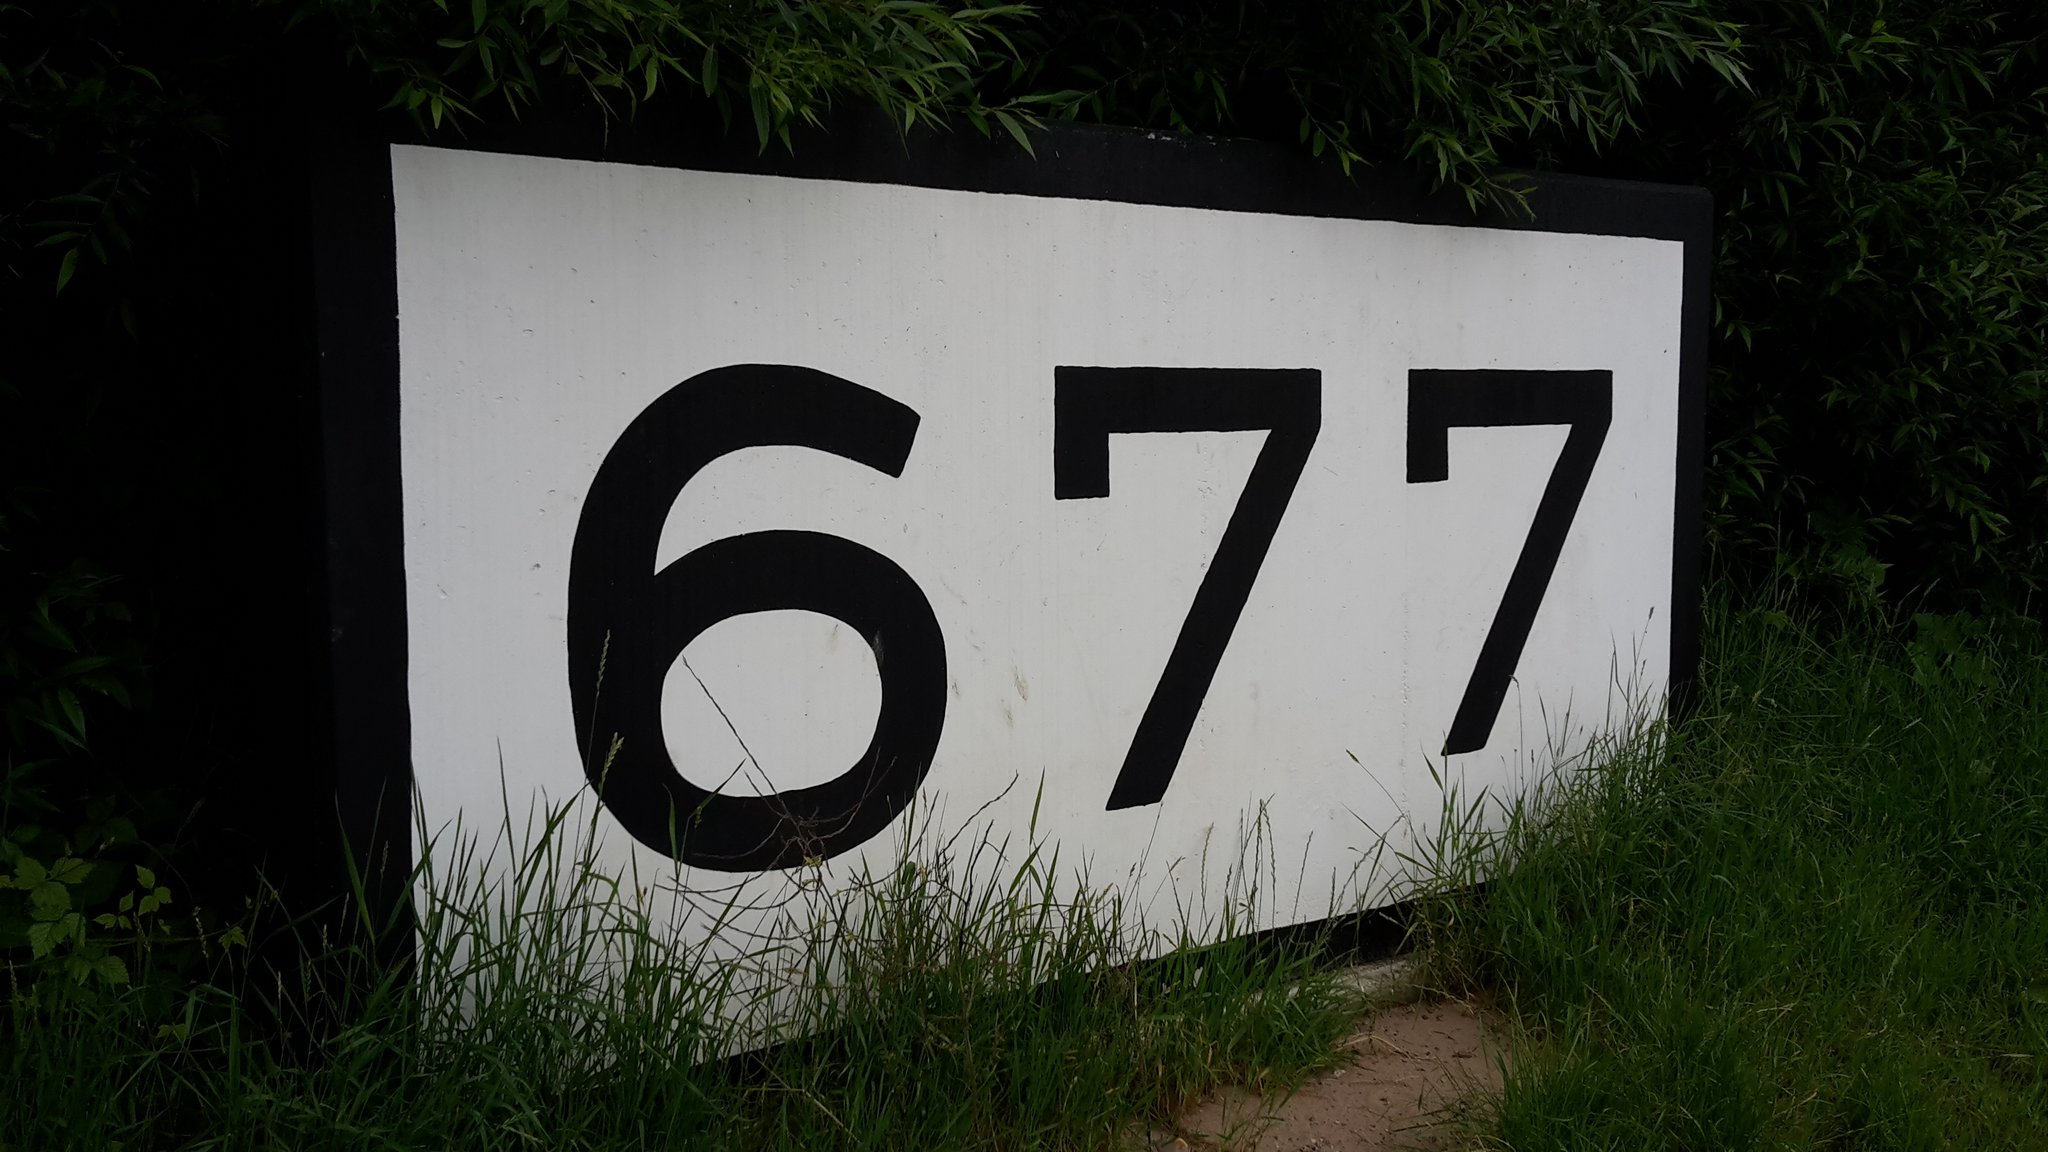 rheinkilometer-677